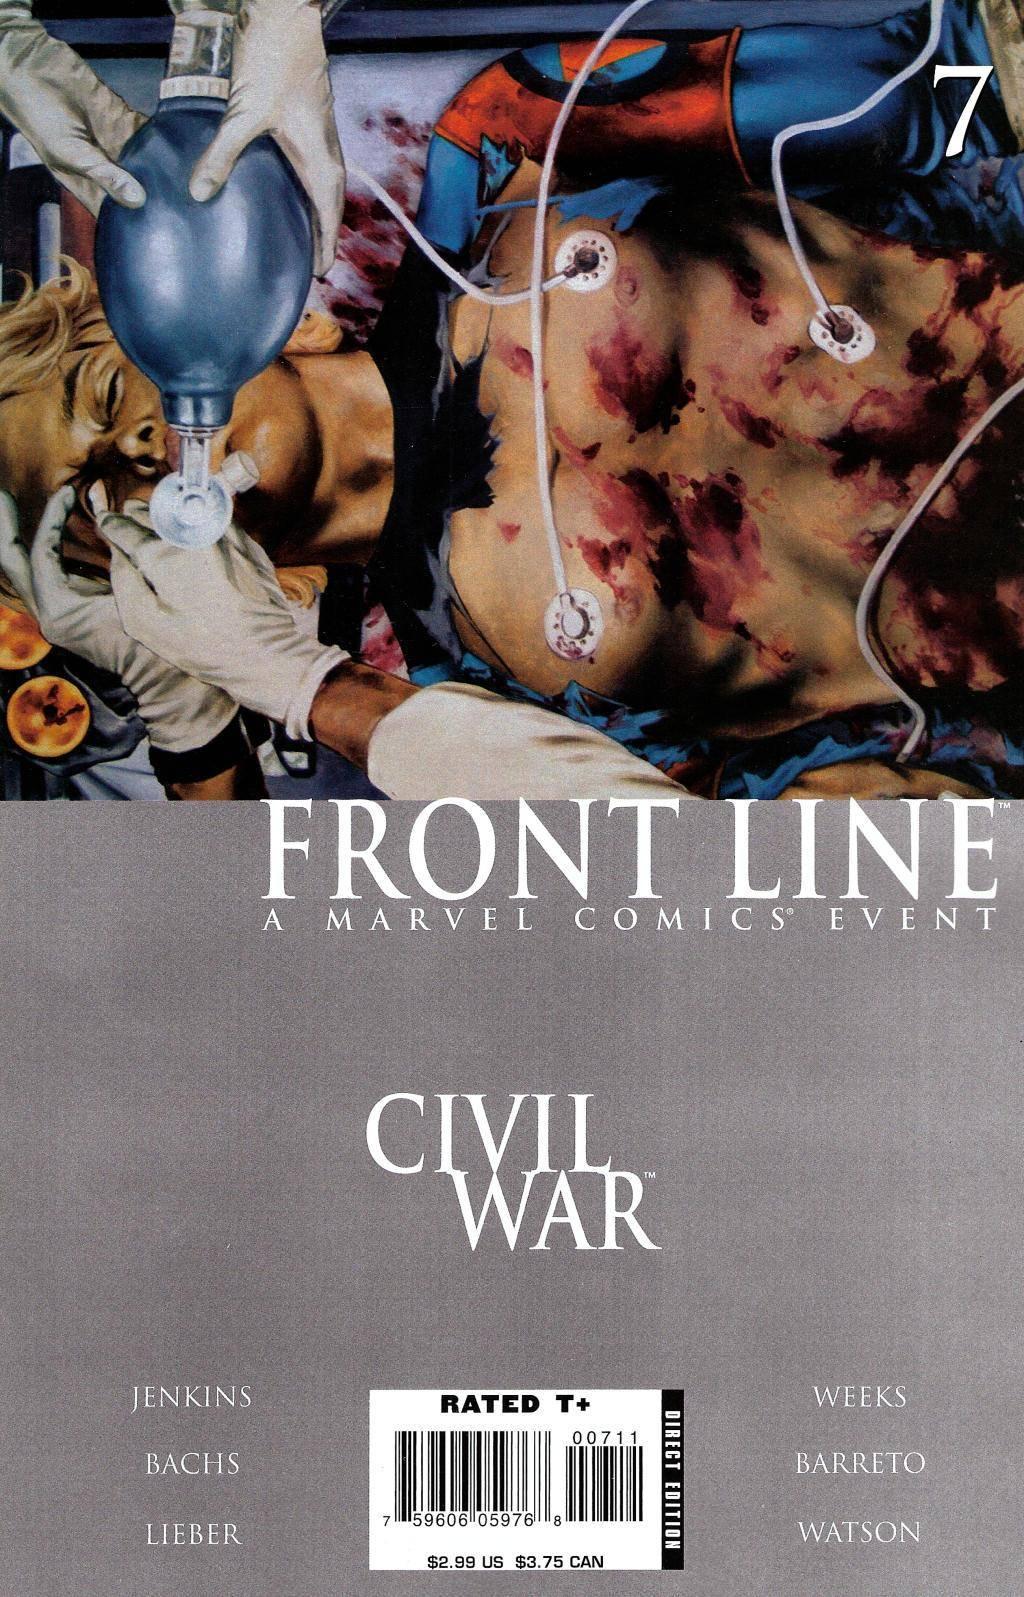 Civil War - Frontline 07